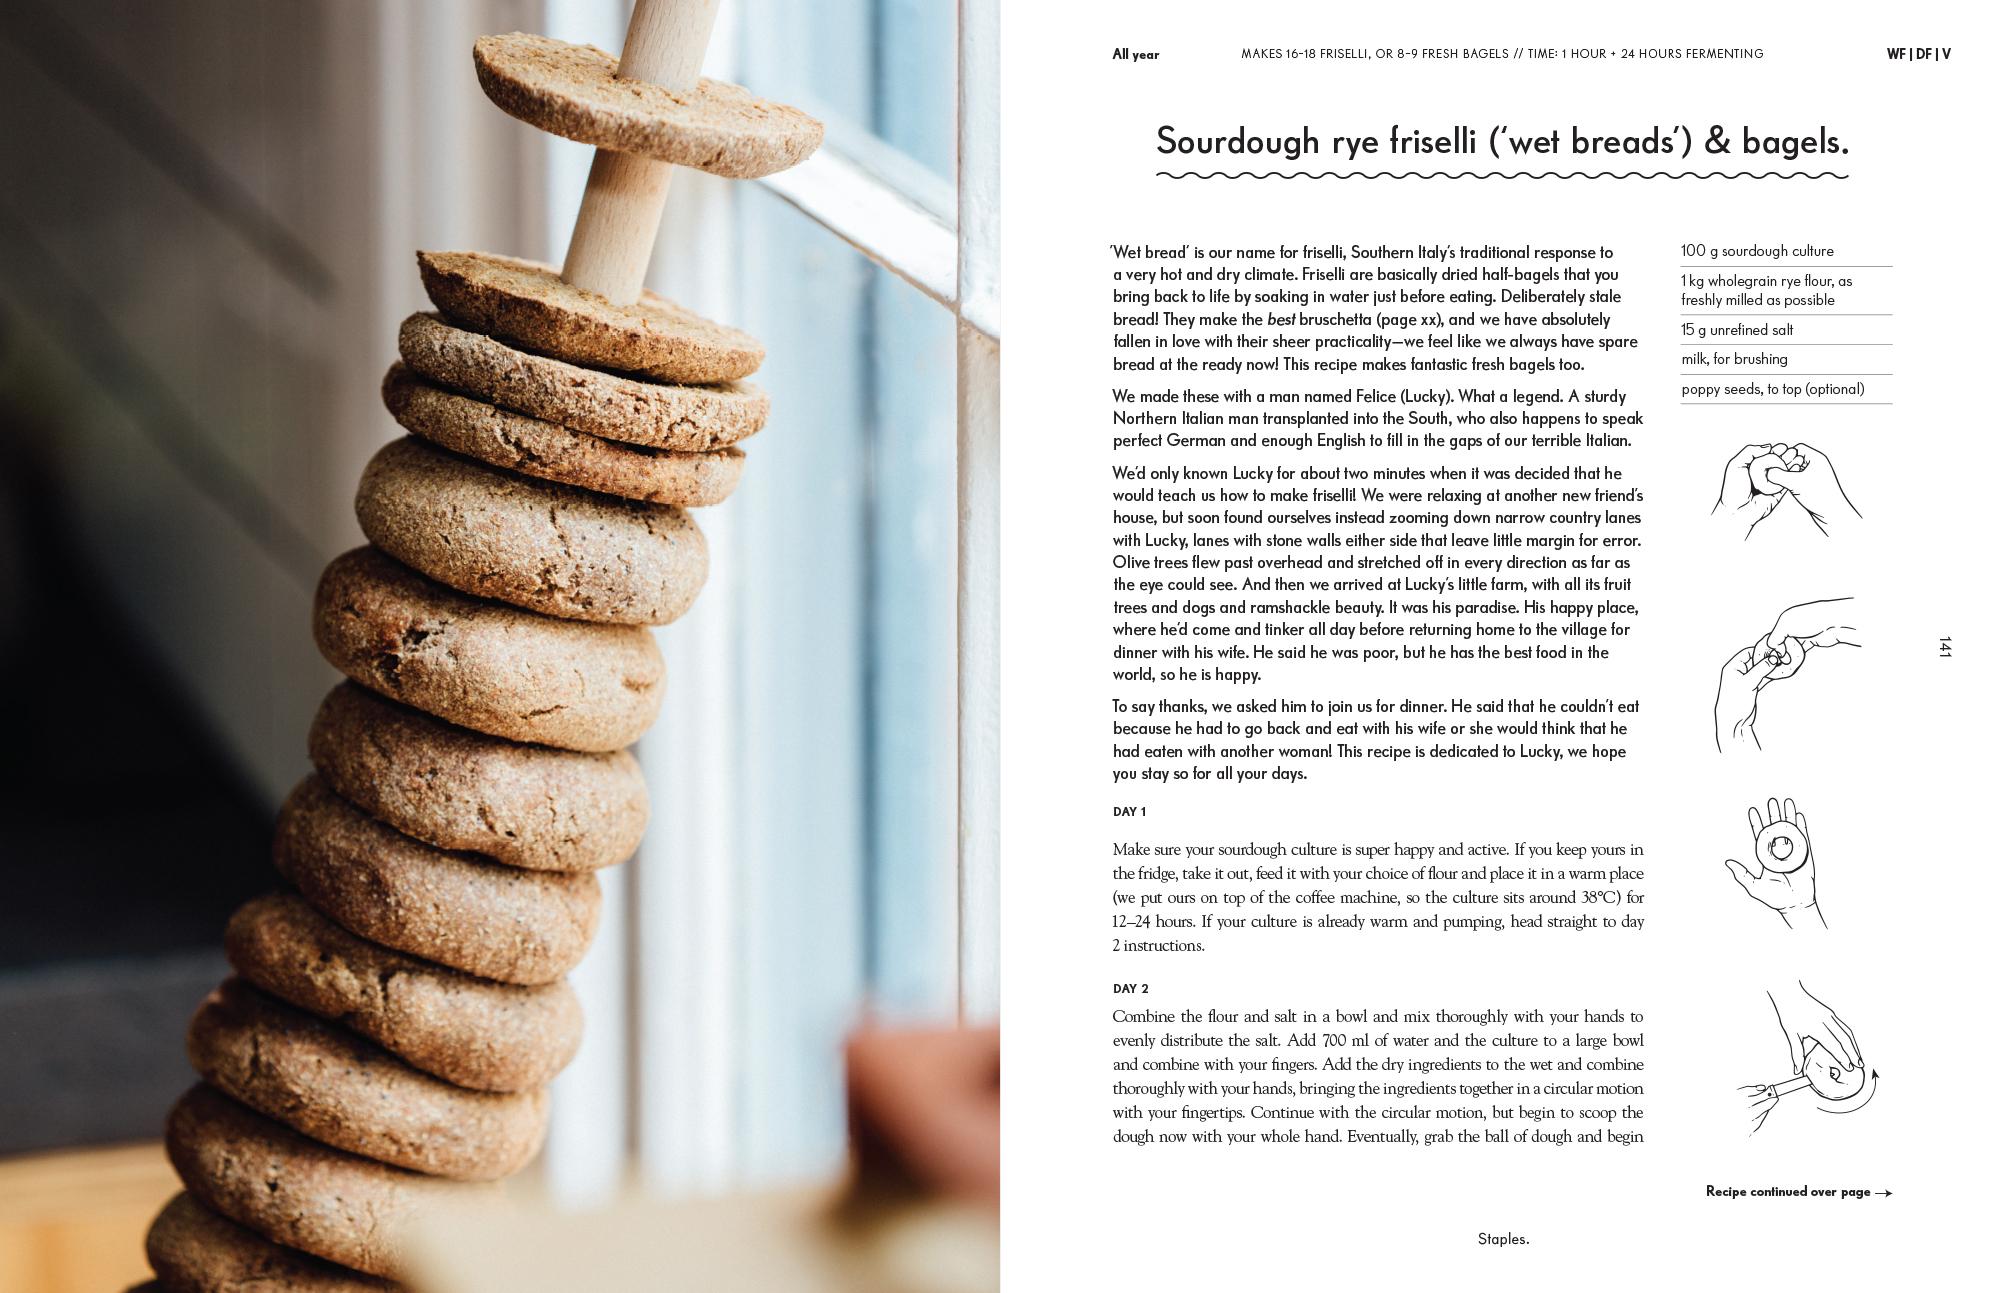 sourdough rye friselli extract